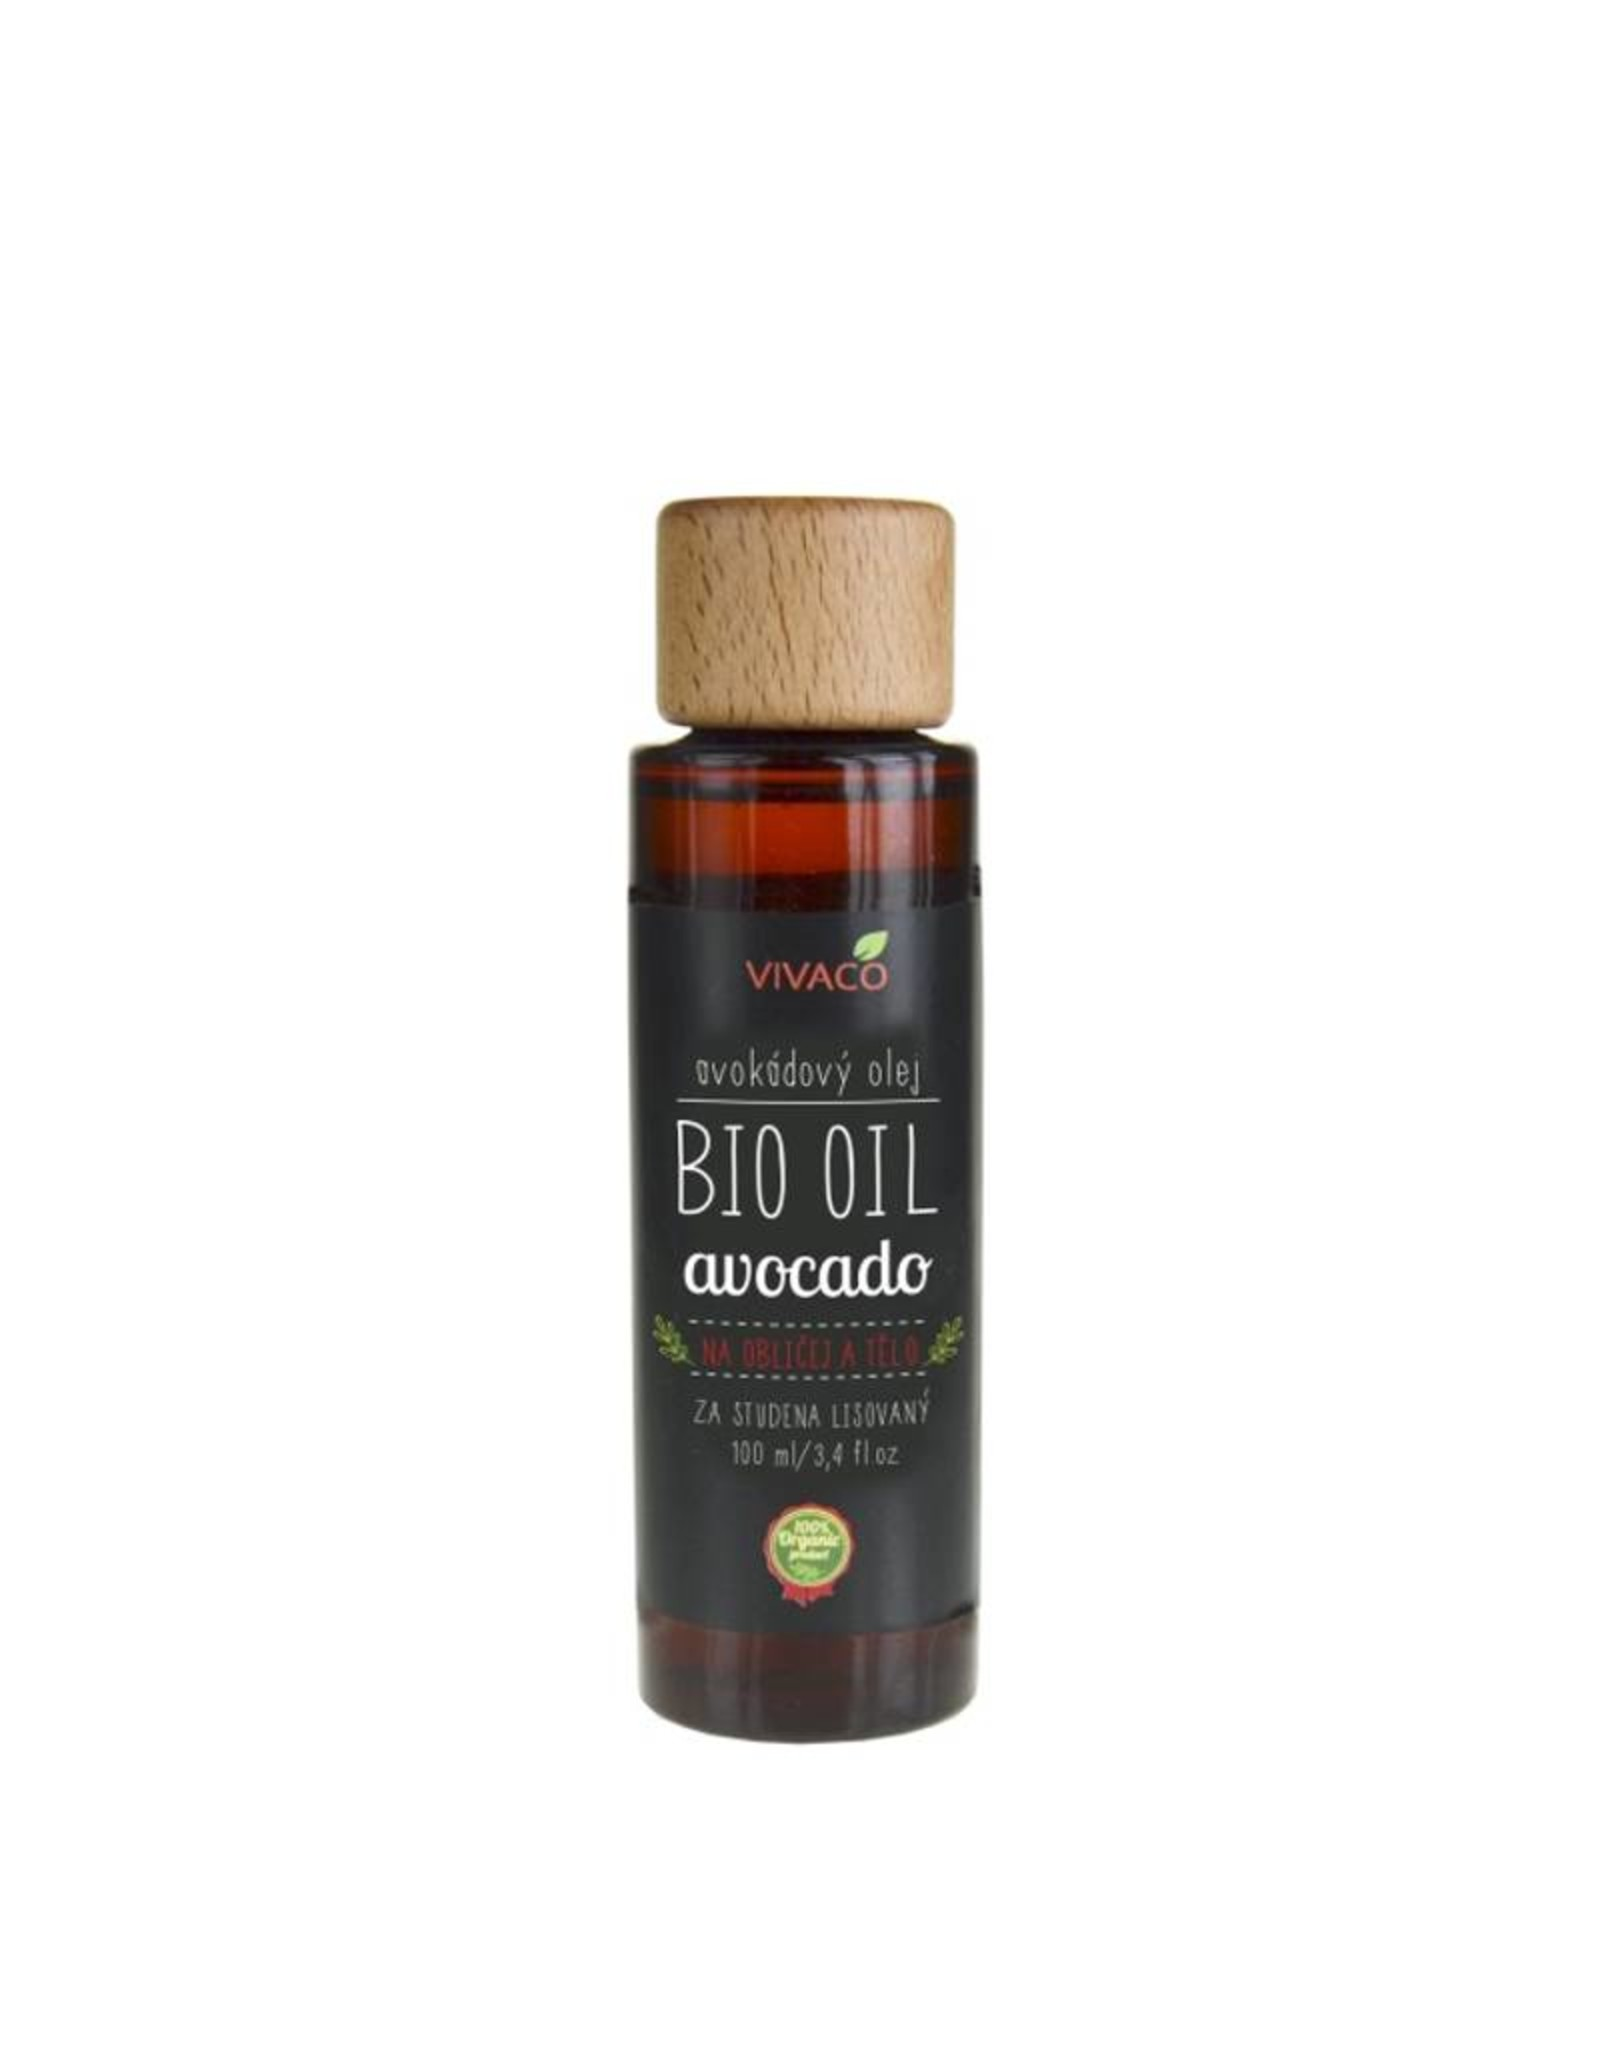 VIVACO BIO OIL - Avocado Olie (100% organisch)